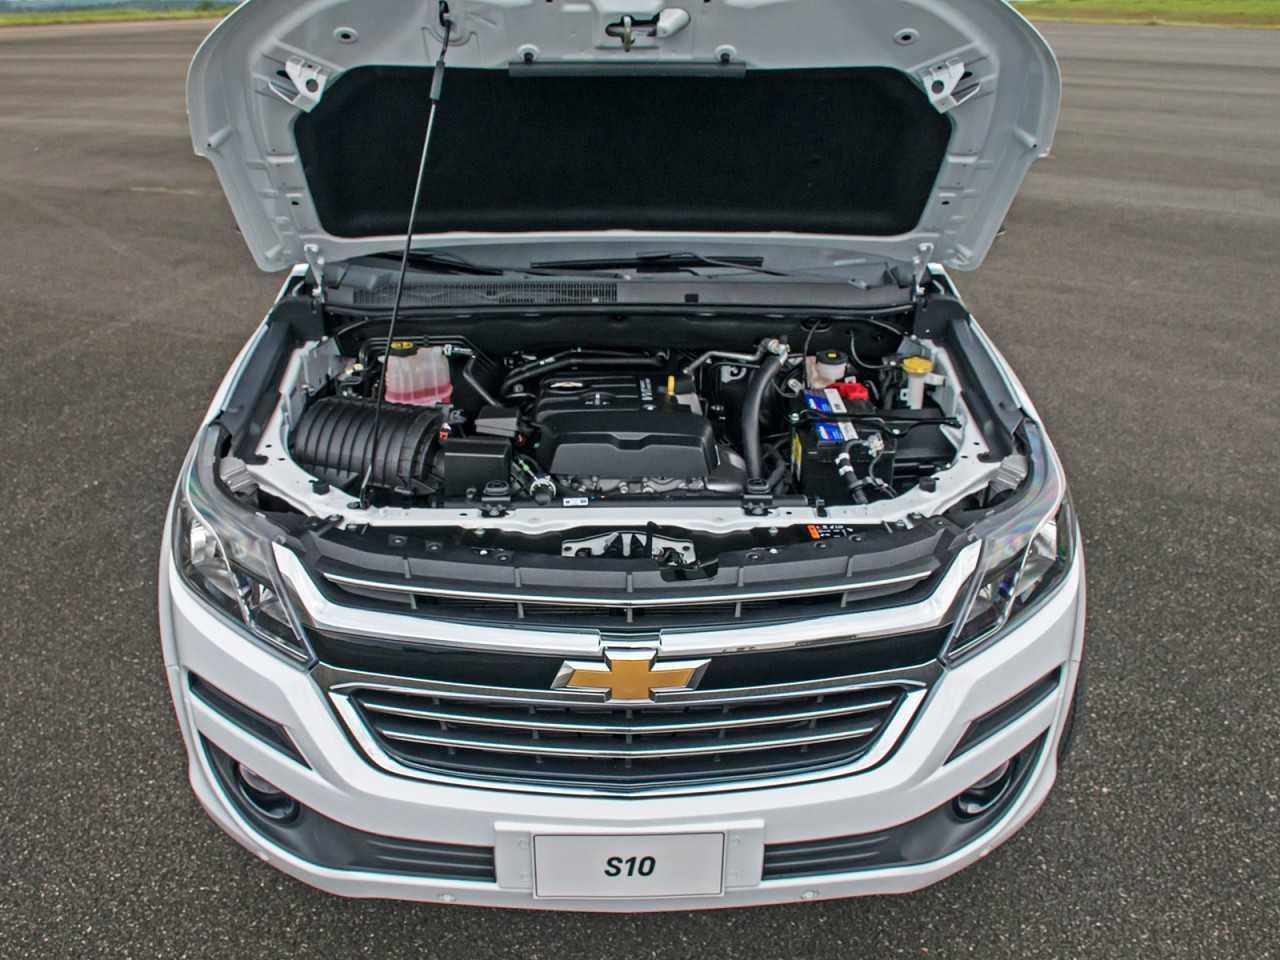 ChevroletS10 2018 - motor